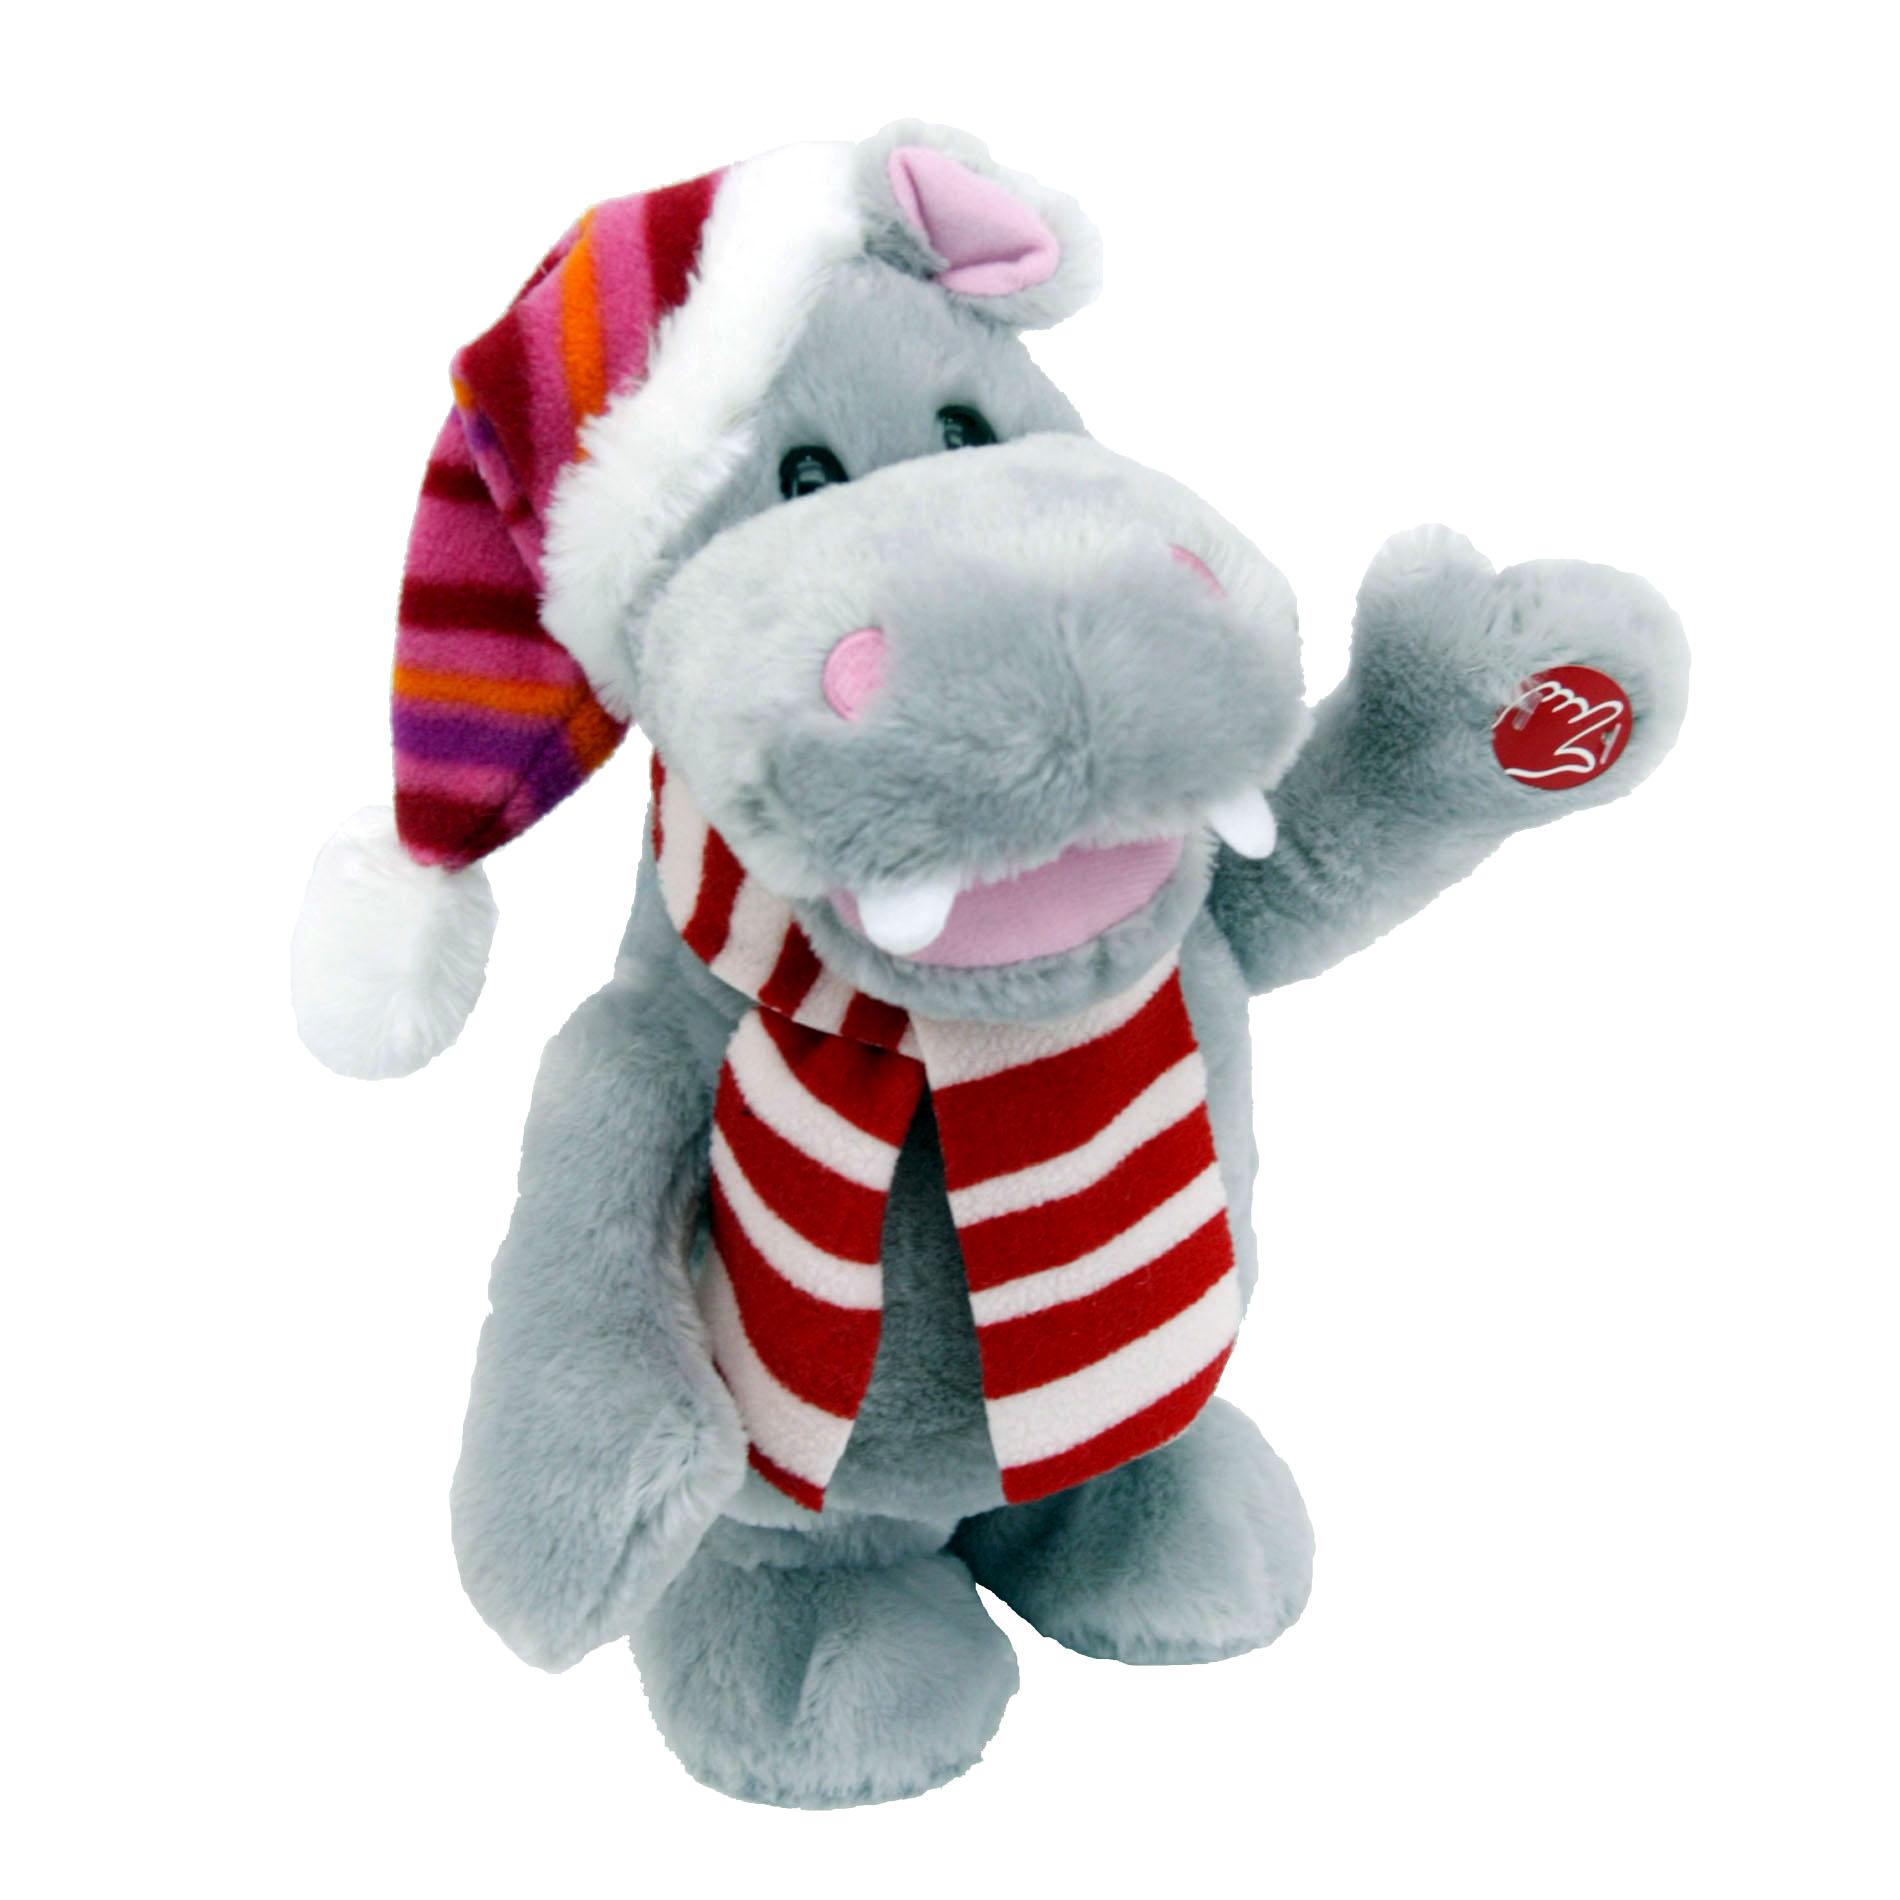 Animated Christmas Toys : Trim a home quot walking animated hippo seasonal